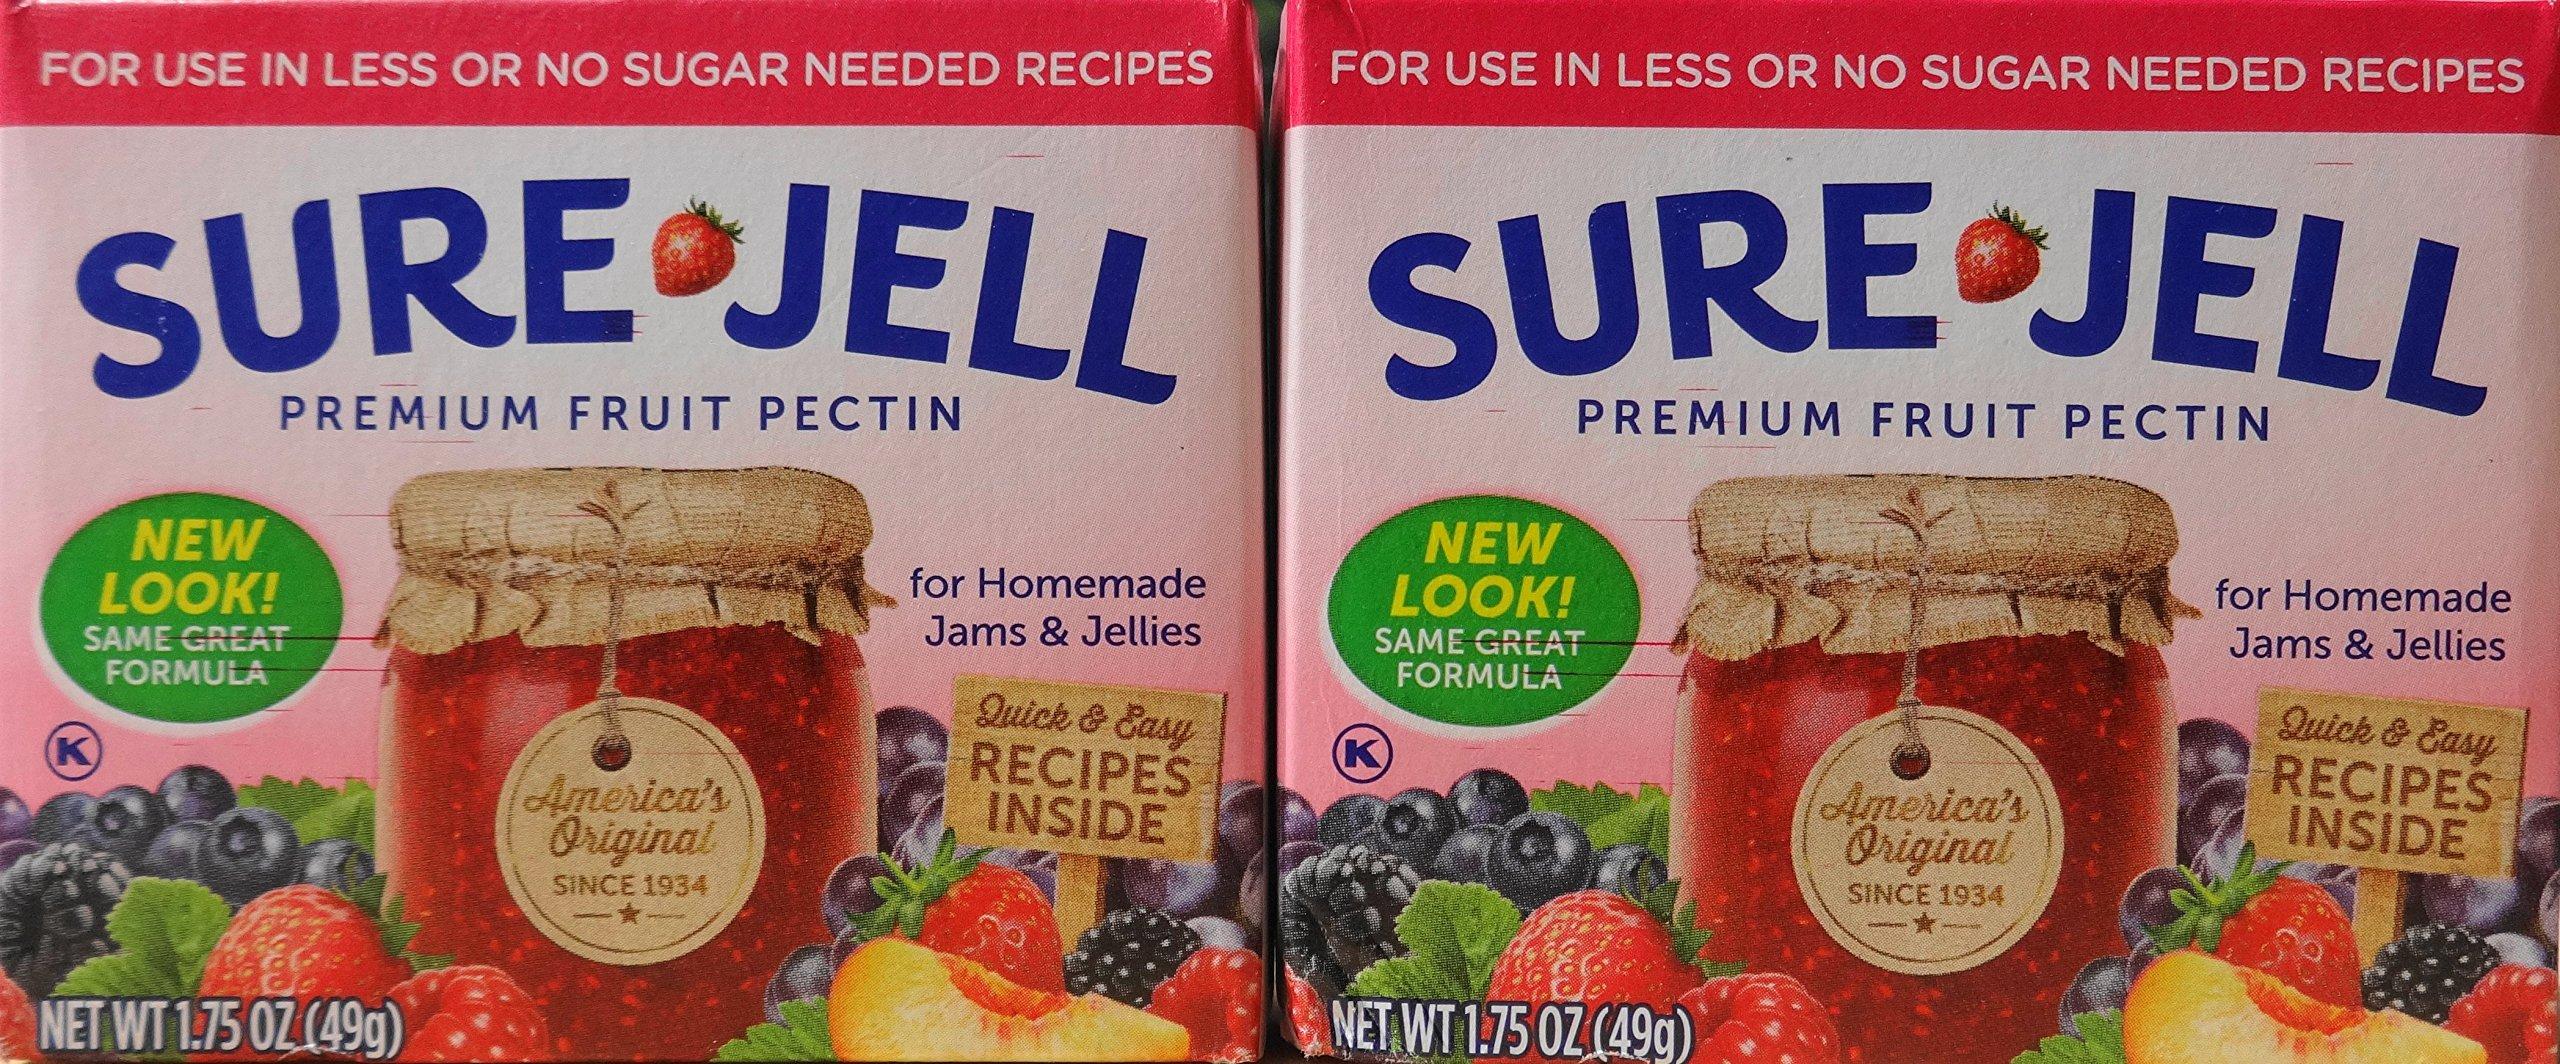 Sure Jell Premium Fruit Pectin, 1.75 Oz (49g) Twin Pack